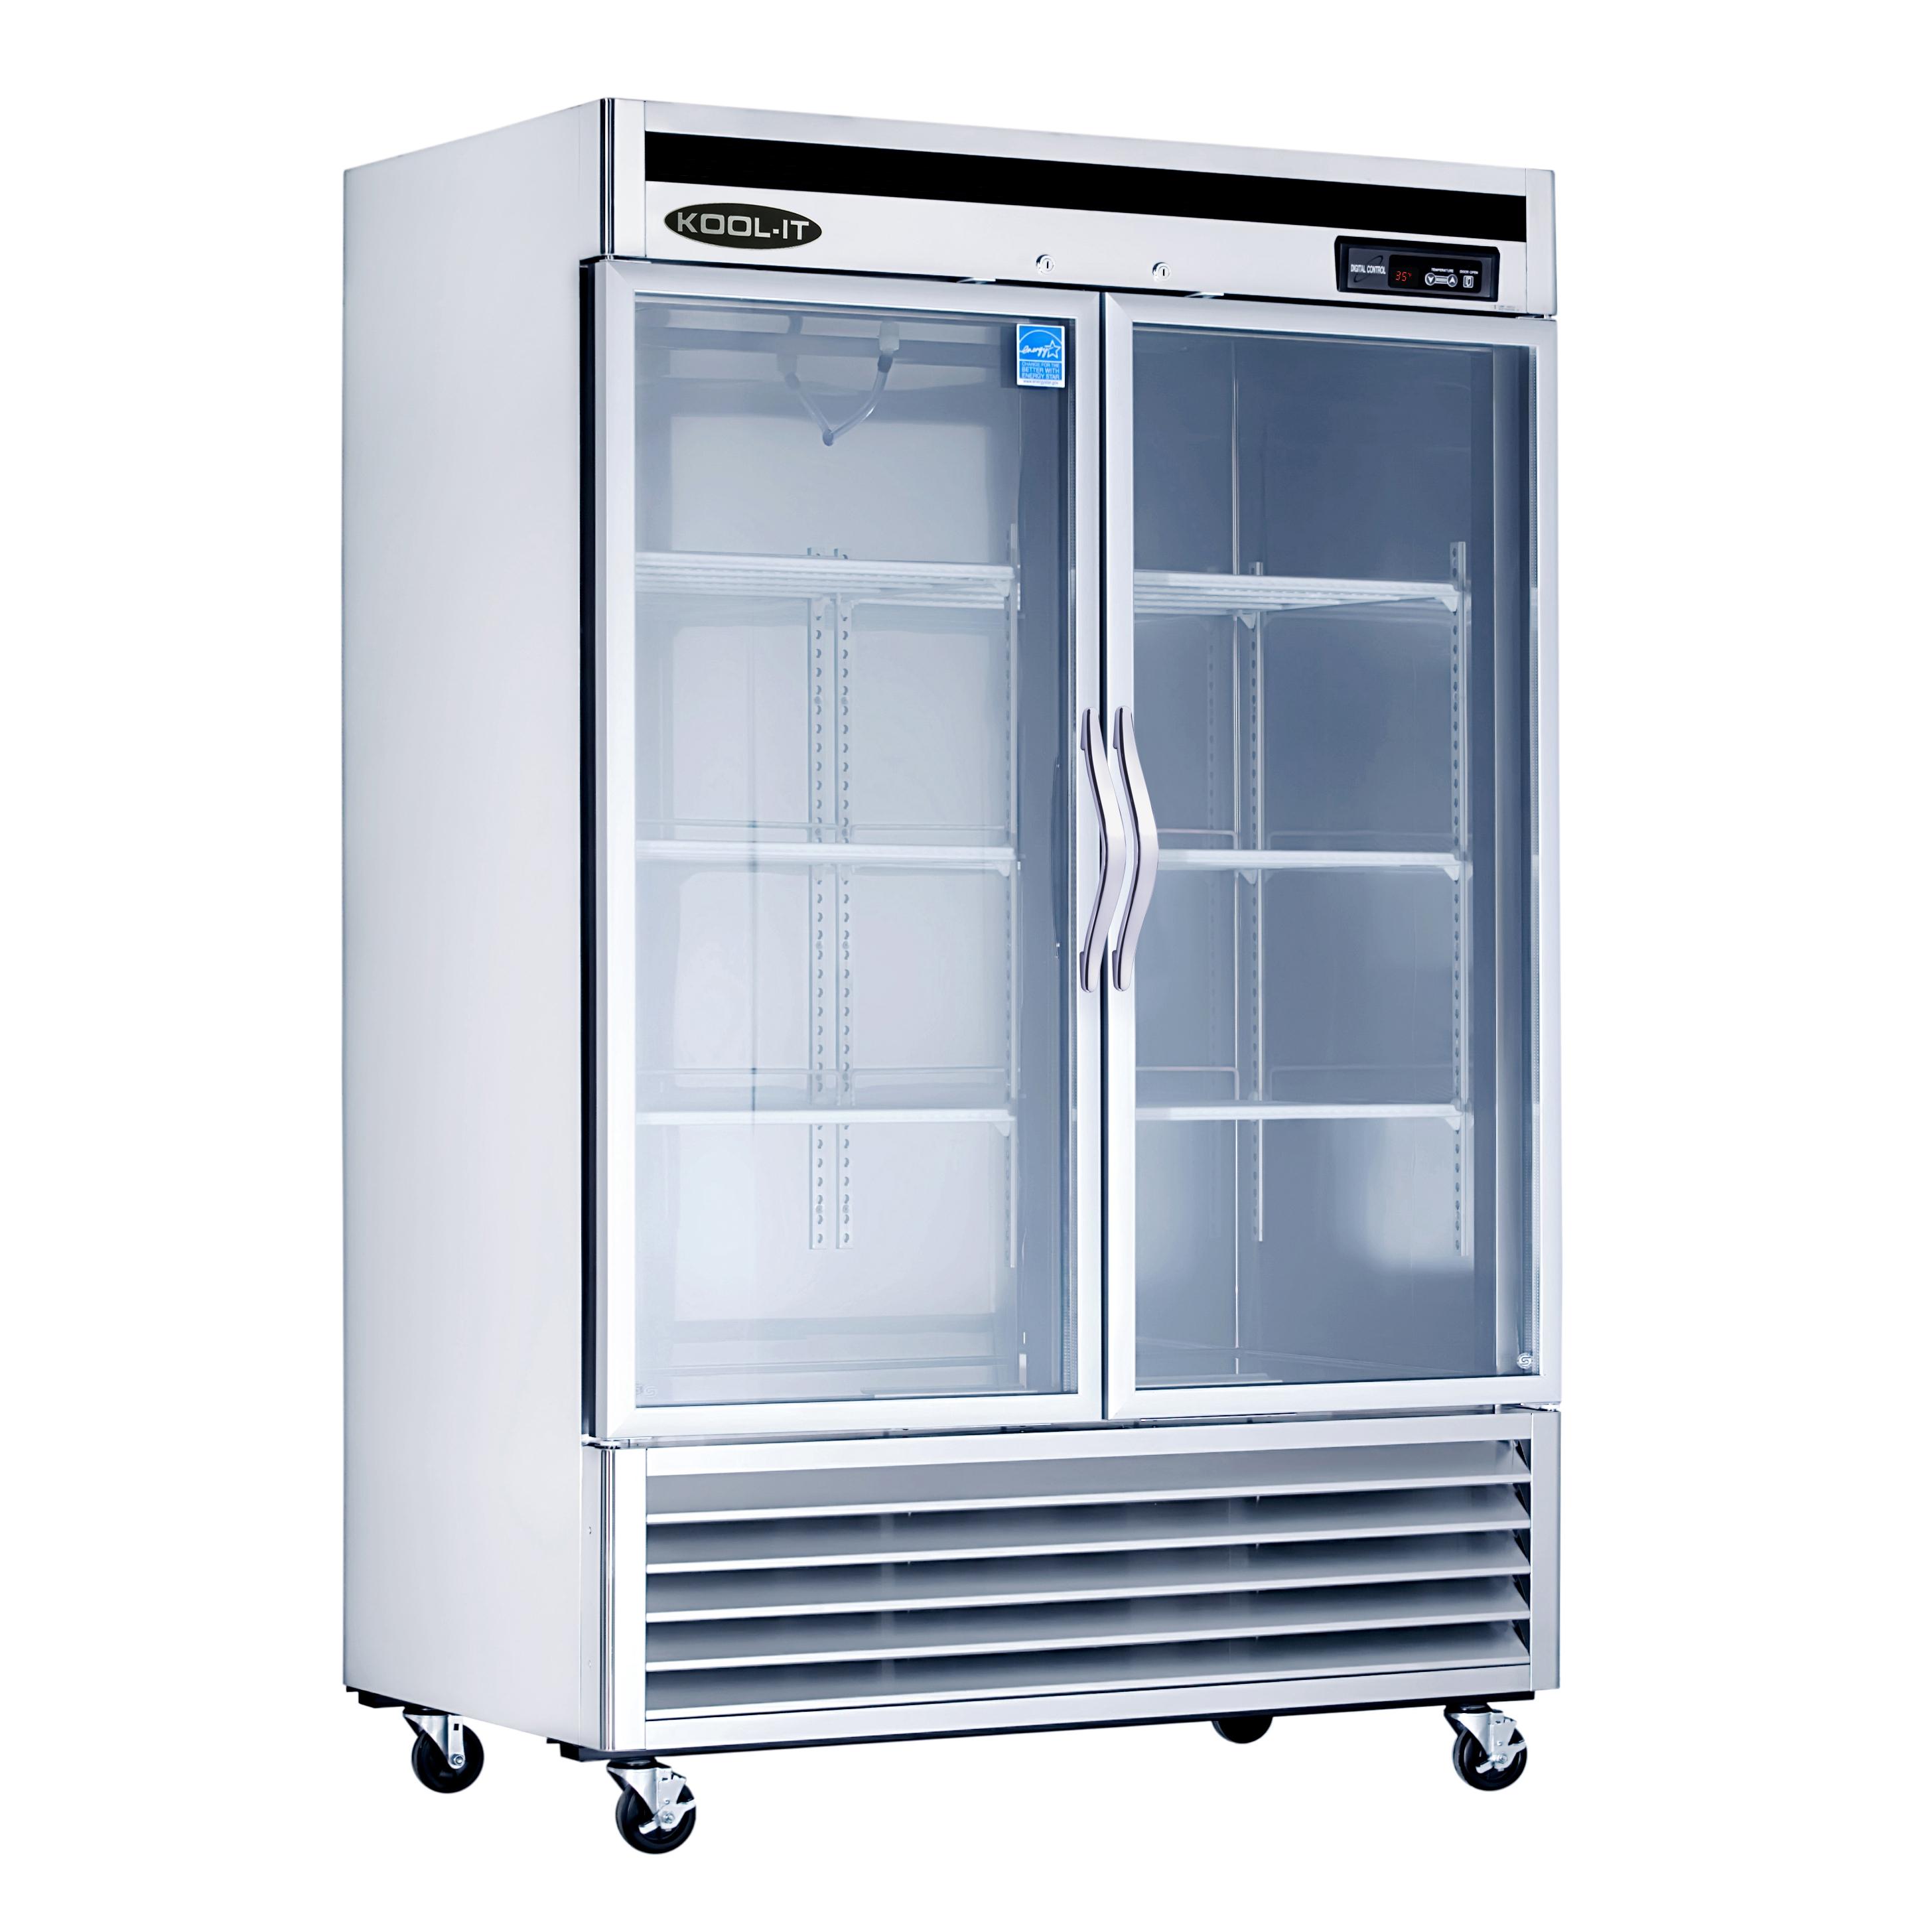 MVP KBSR-2G refrigerator, reach-in